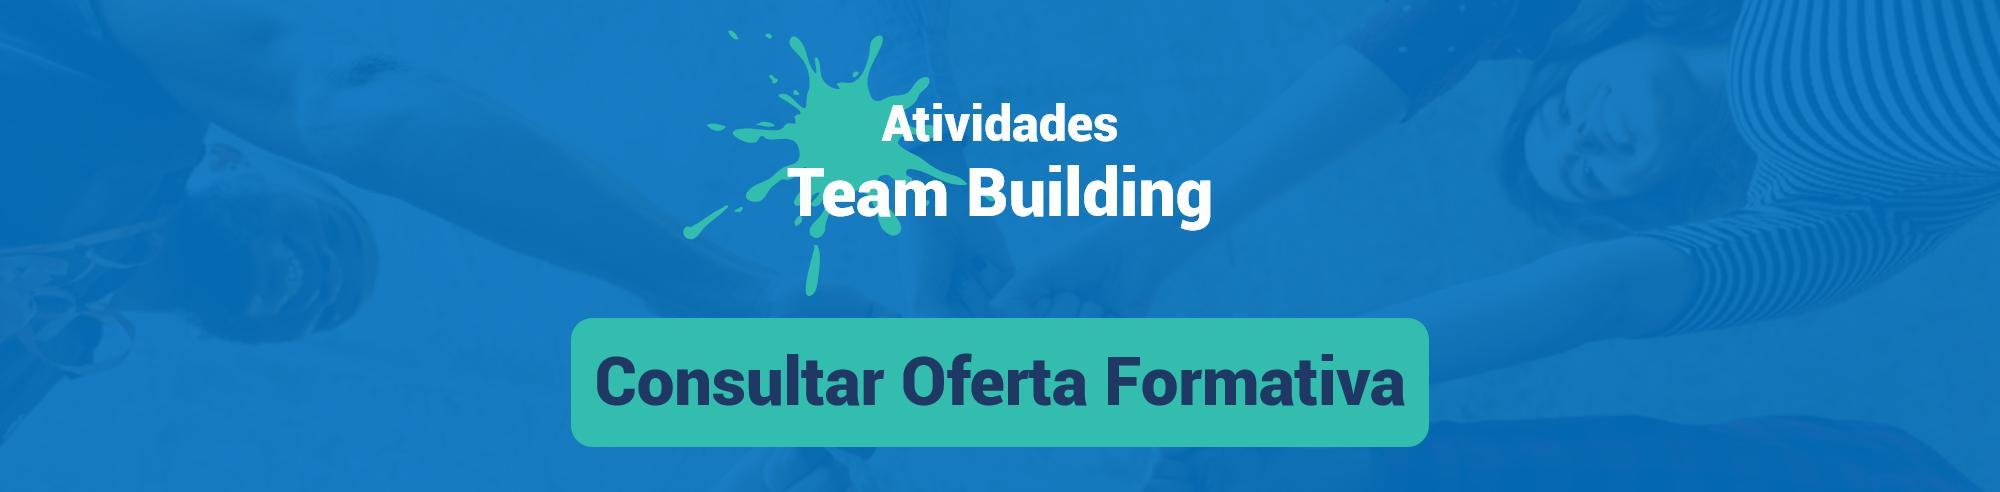 oferta formativa team building 2021